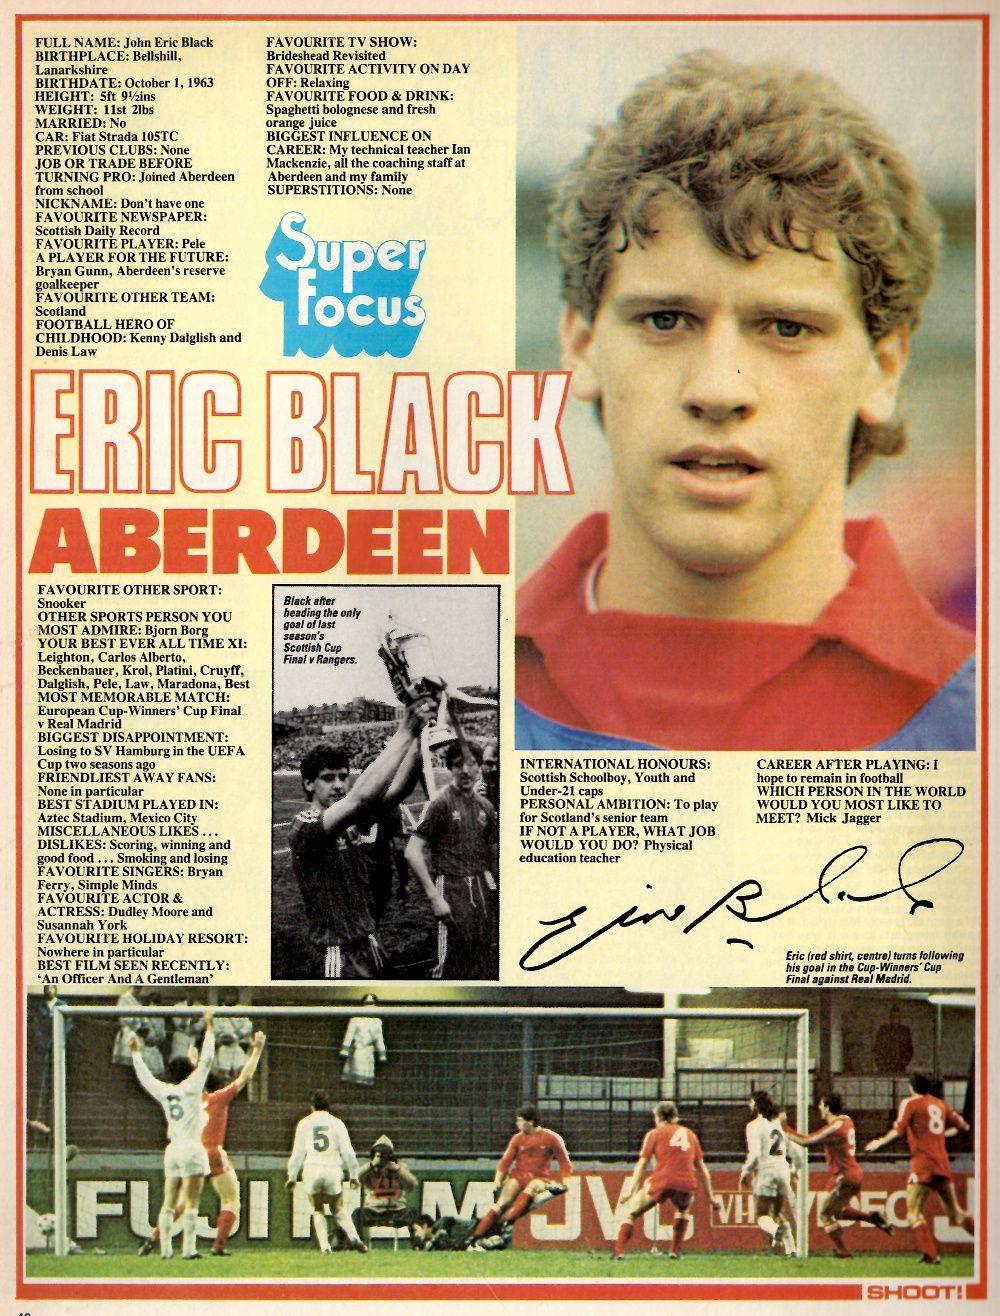 Profile Eric Black Aberdeen Eric Black Aberdeen Eric